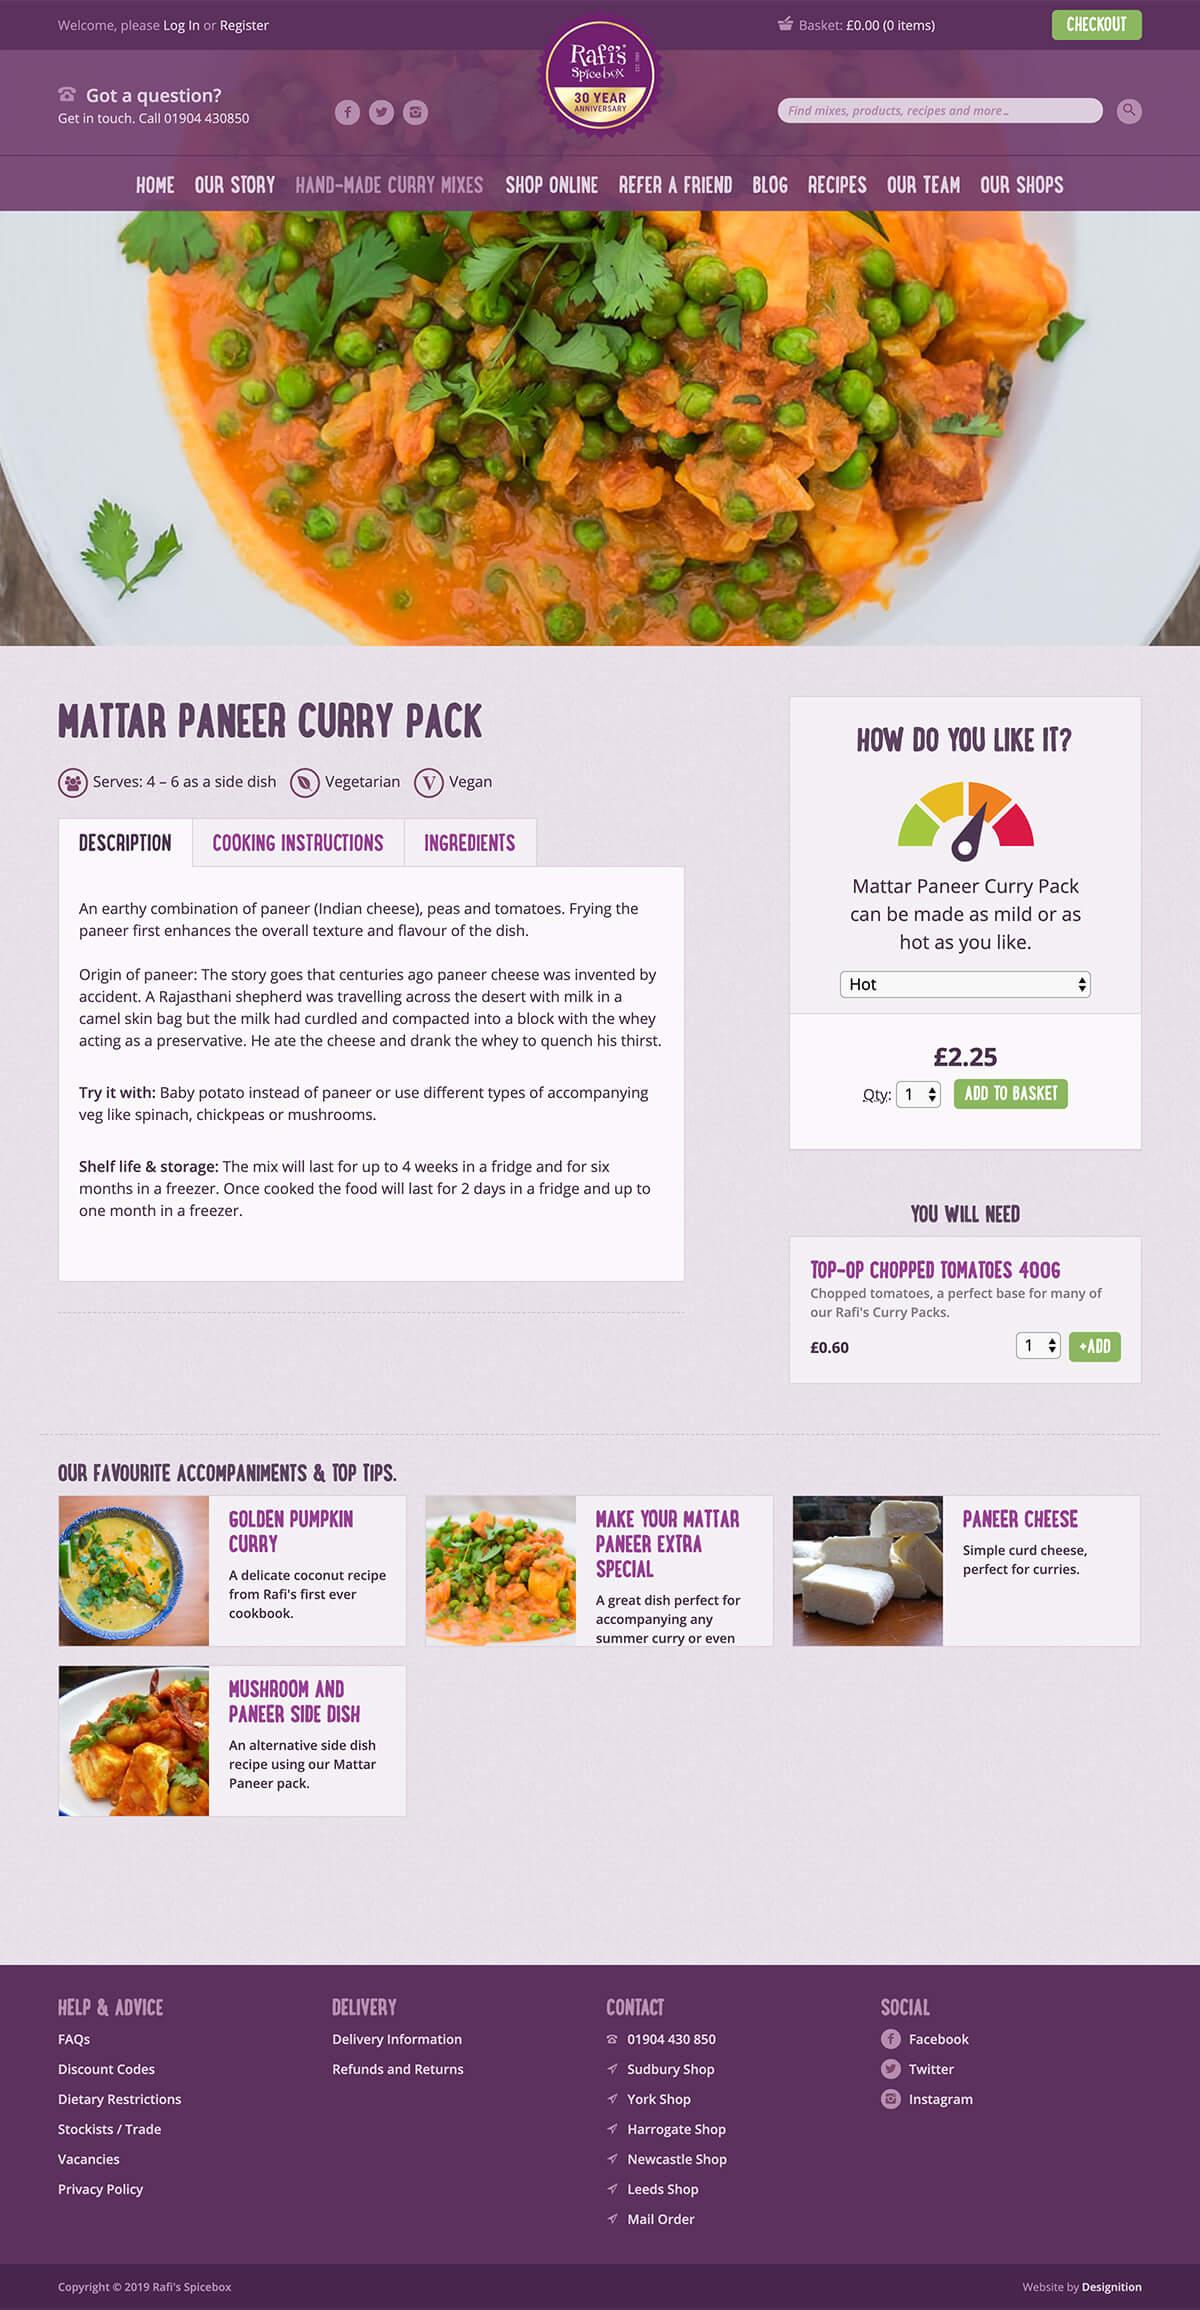 screencapture-spicebox-co-uk-curry-mixes-mattar-paneer-html-2019-08-24-23_32_28.jpg